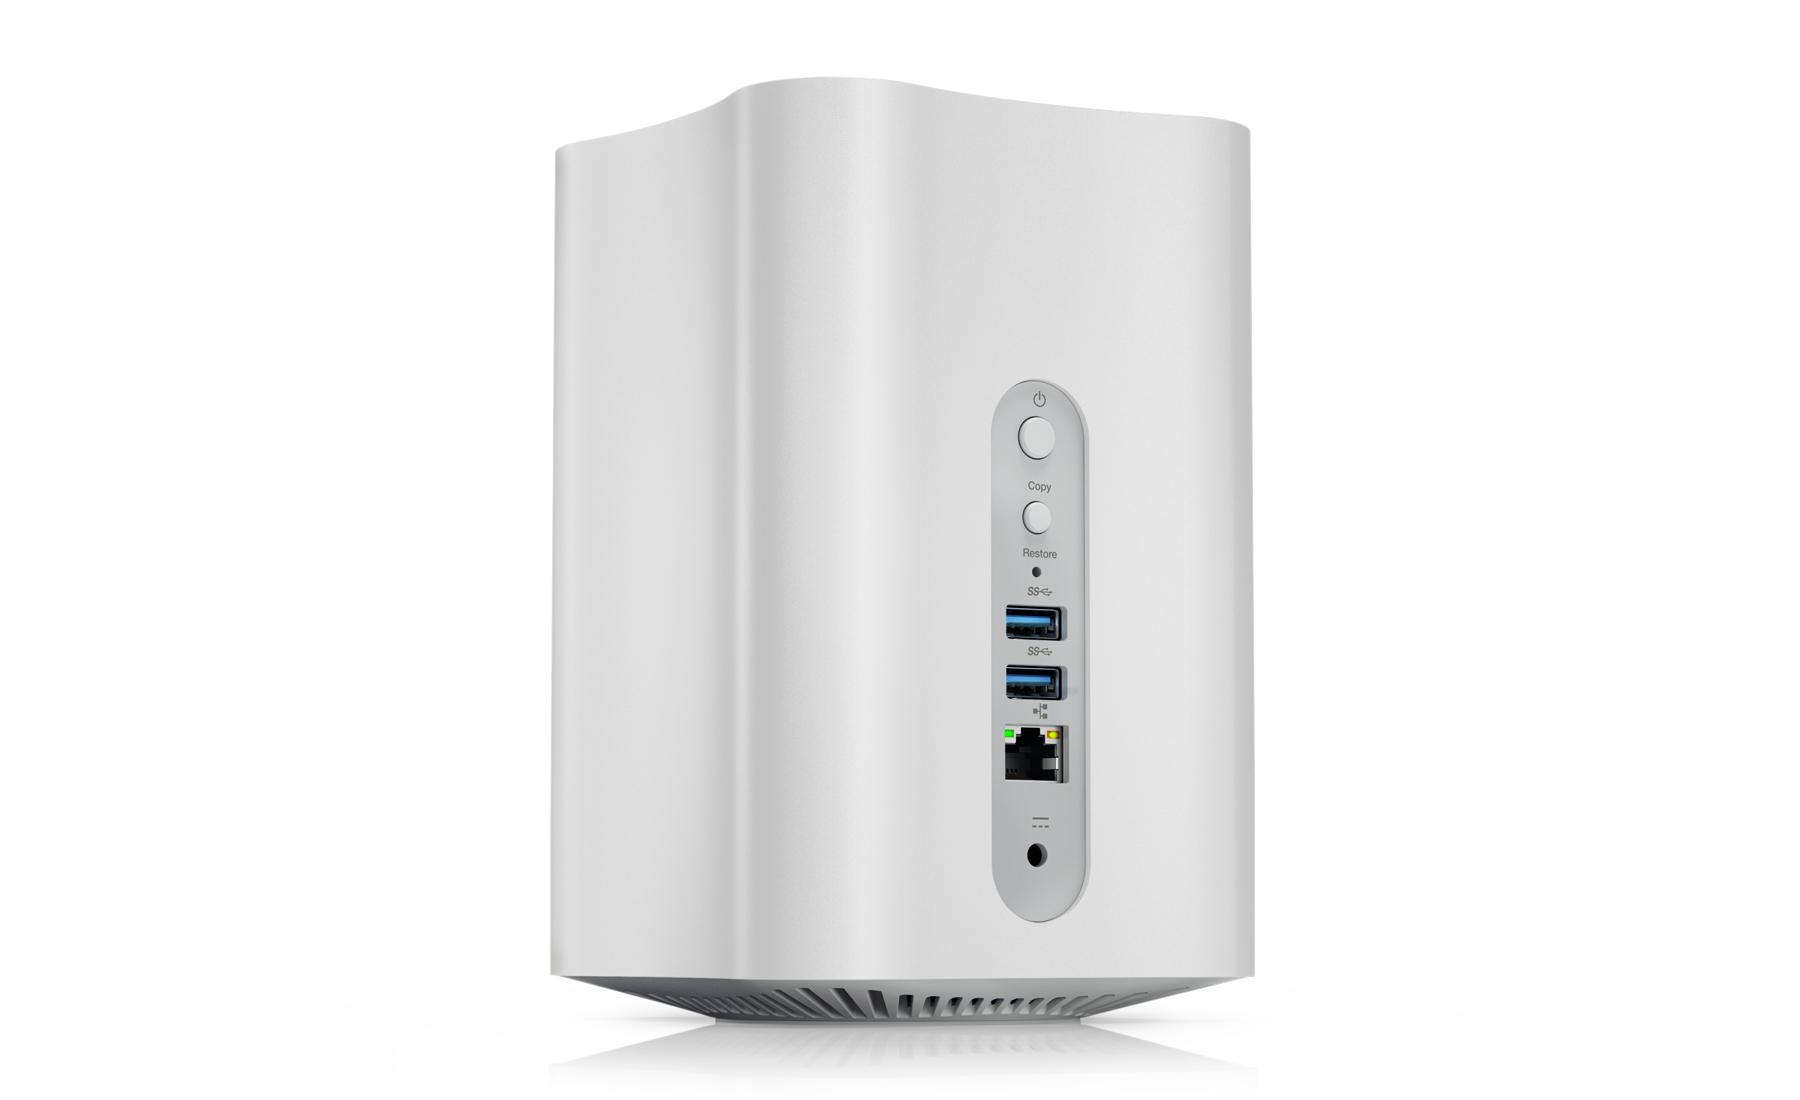 lenovo-smart-storage-2.jpg